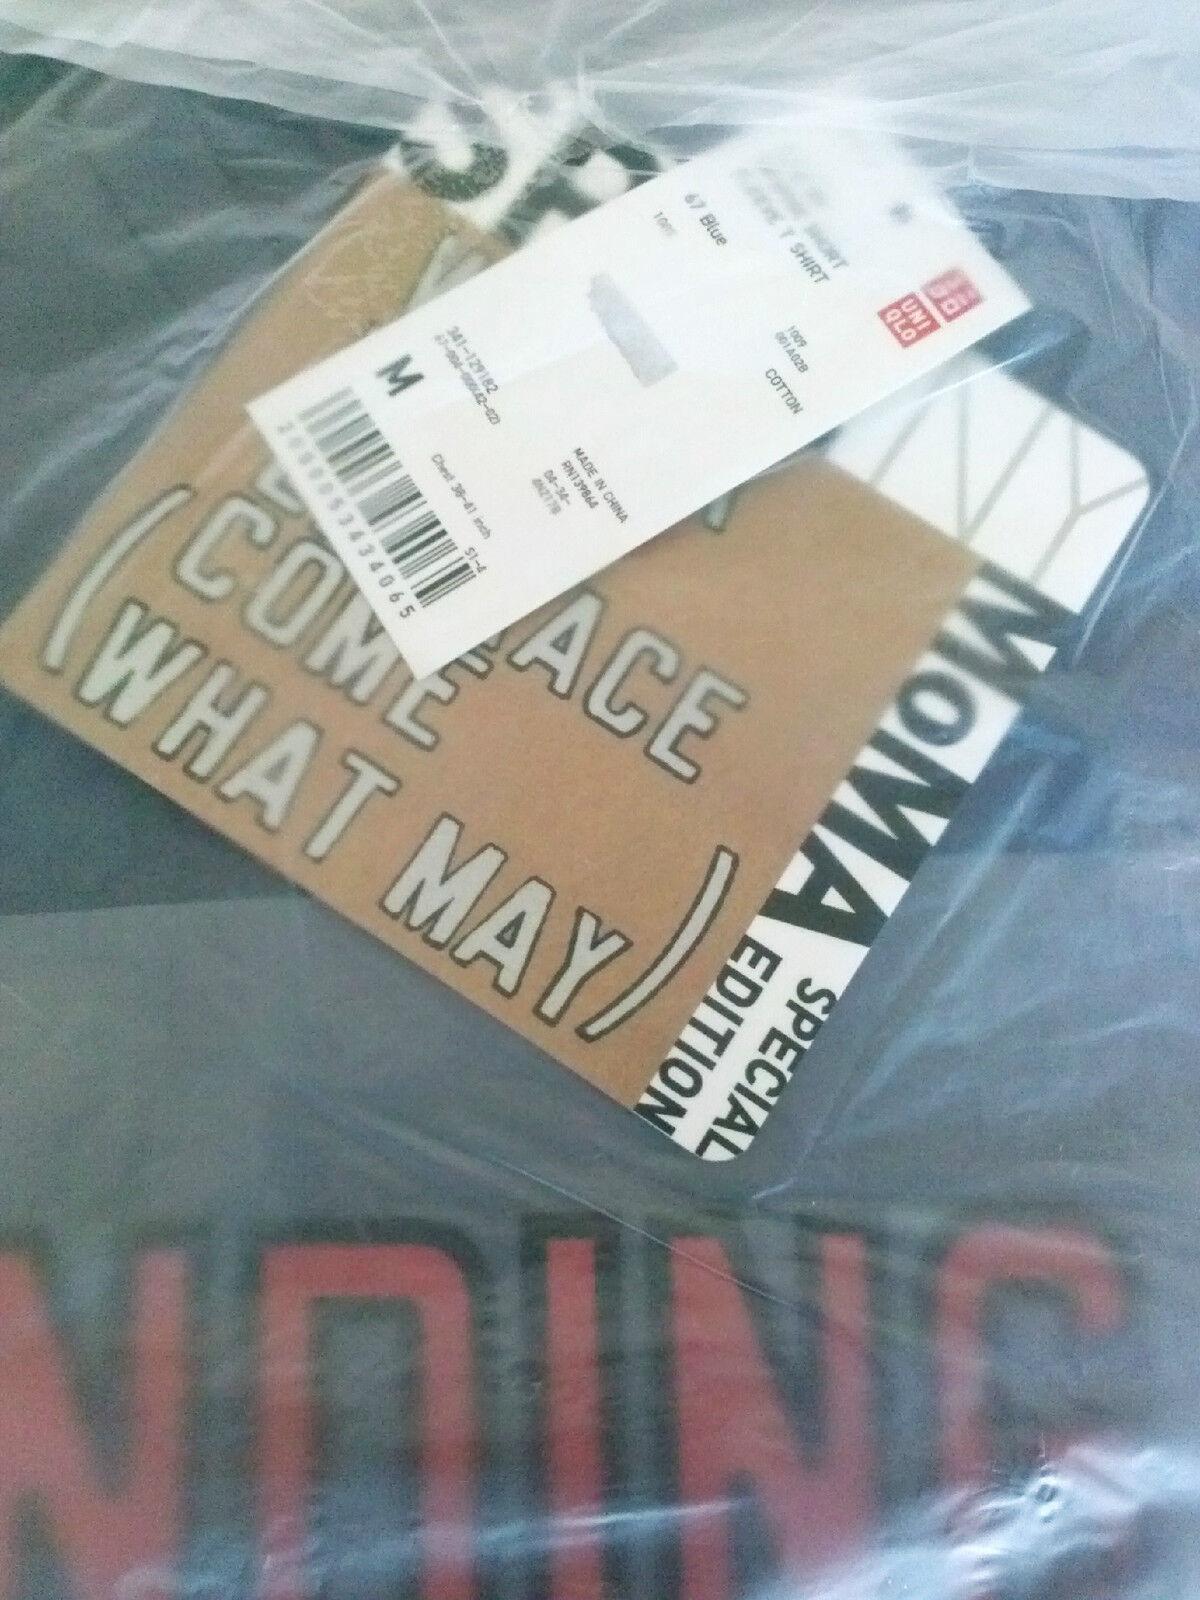 LAWRENCE WEINER x UNIQLO /'PENDING RESOLVE/' SPRZ NY Art T-Shirt MEDIUM Blue *NEW*